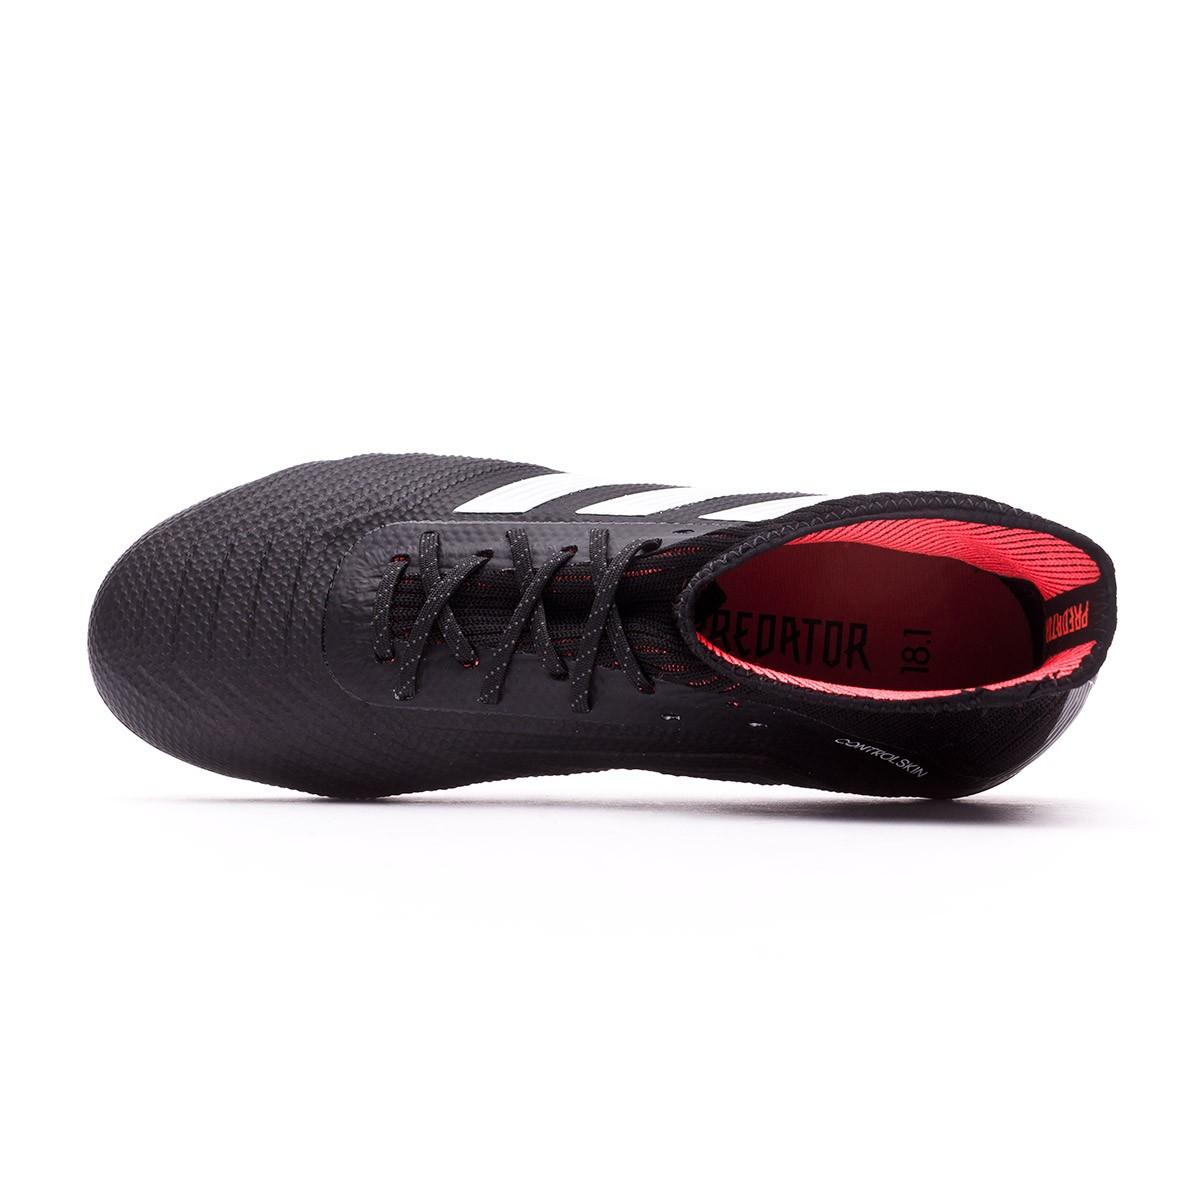 c8dceaafb Zapatos de fútbol adidas Predator 18.1 FG Niño Core black-White-Gold  metallic-Solar red - Tienda de fútbol Fútbol Emotion